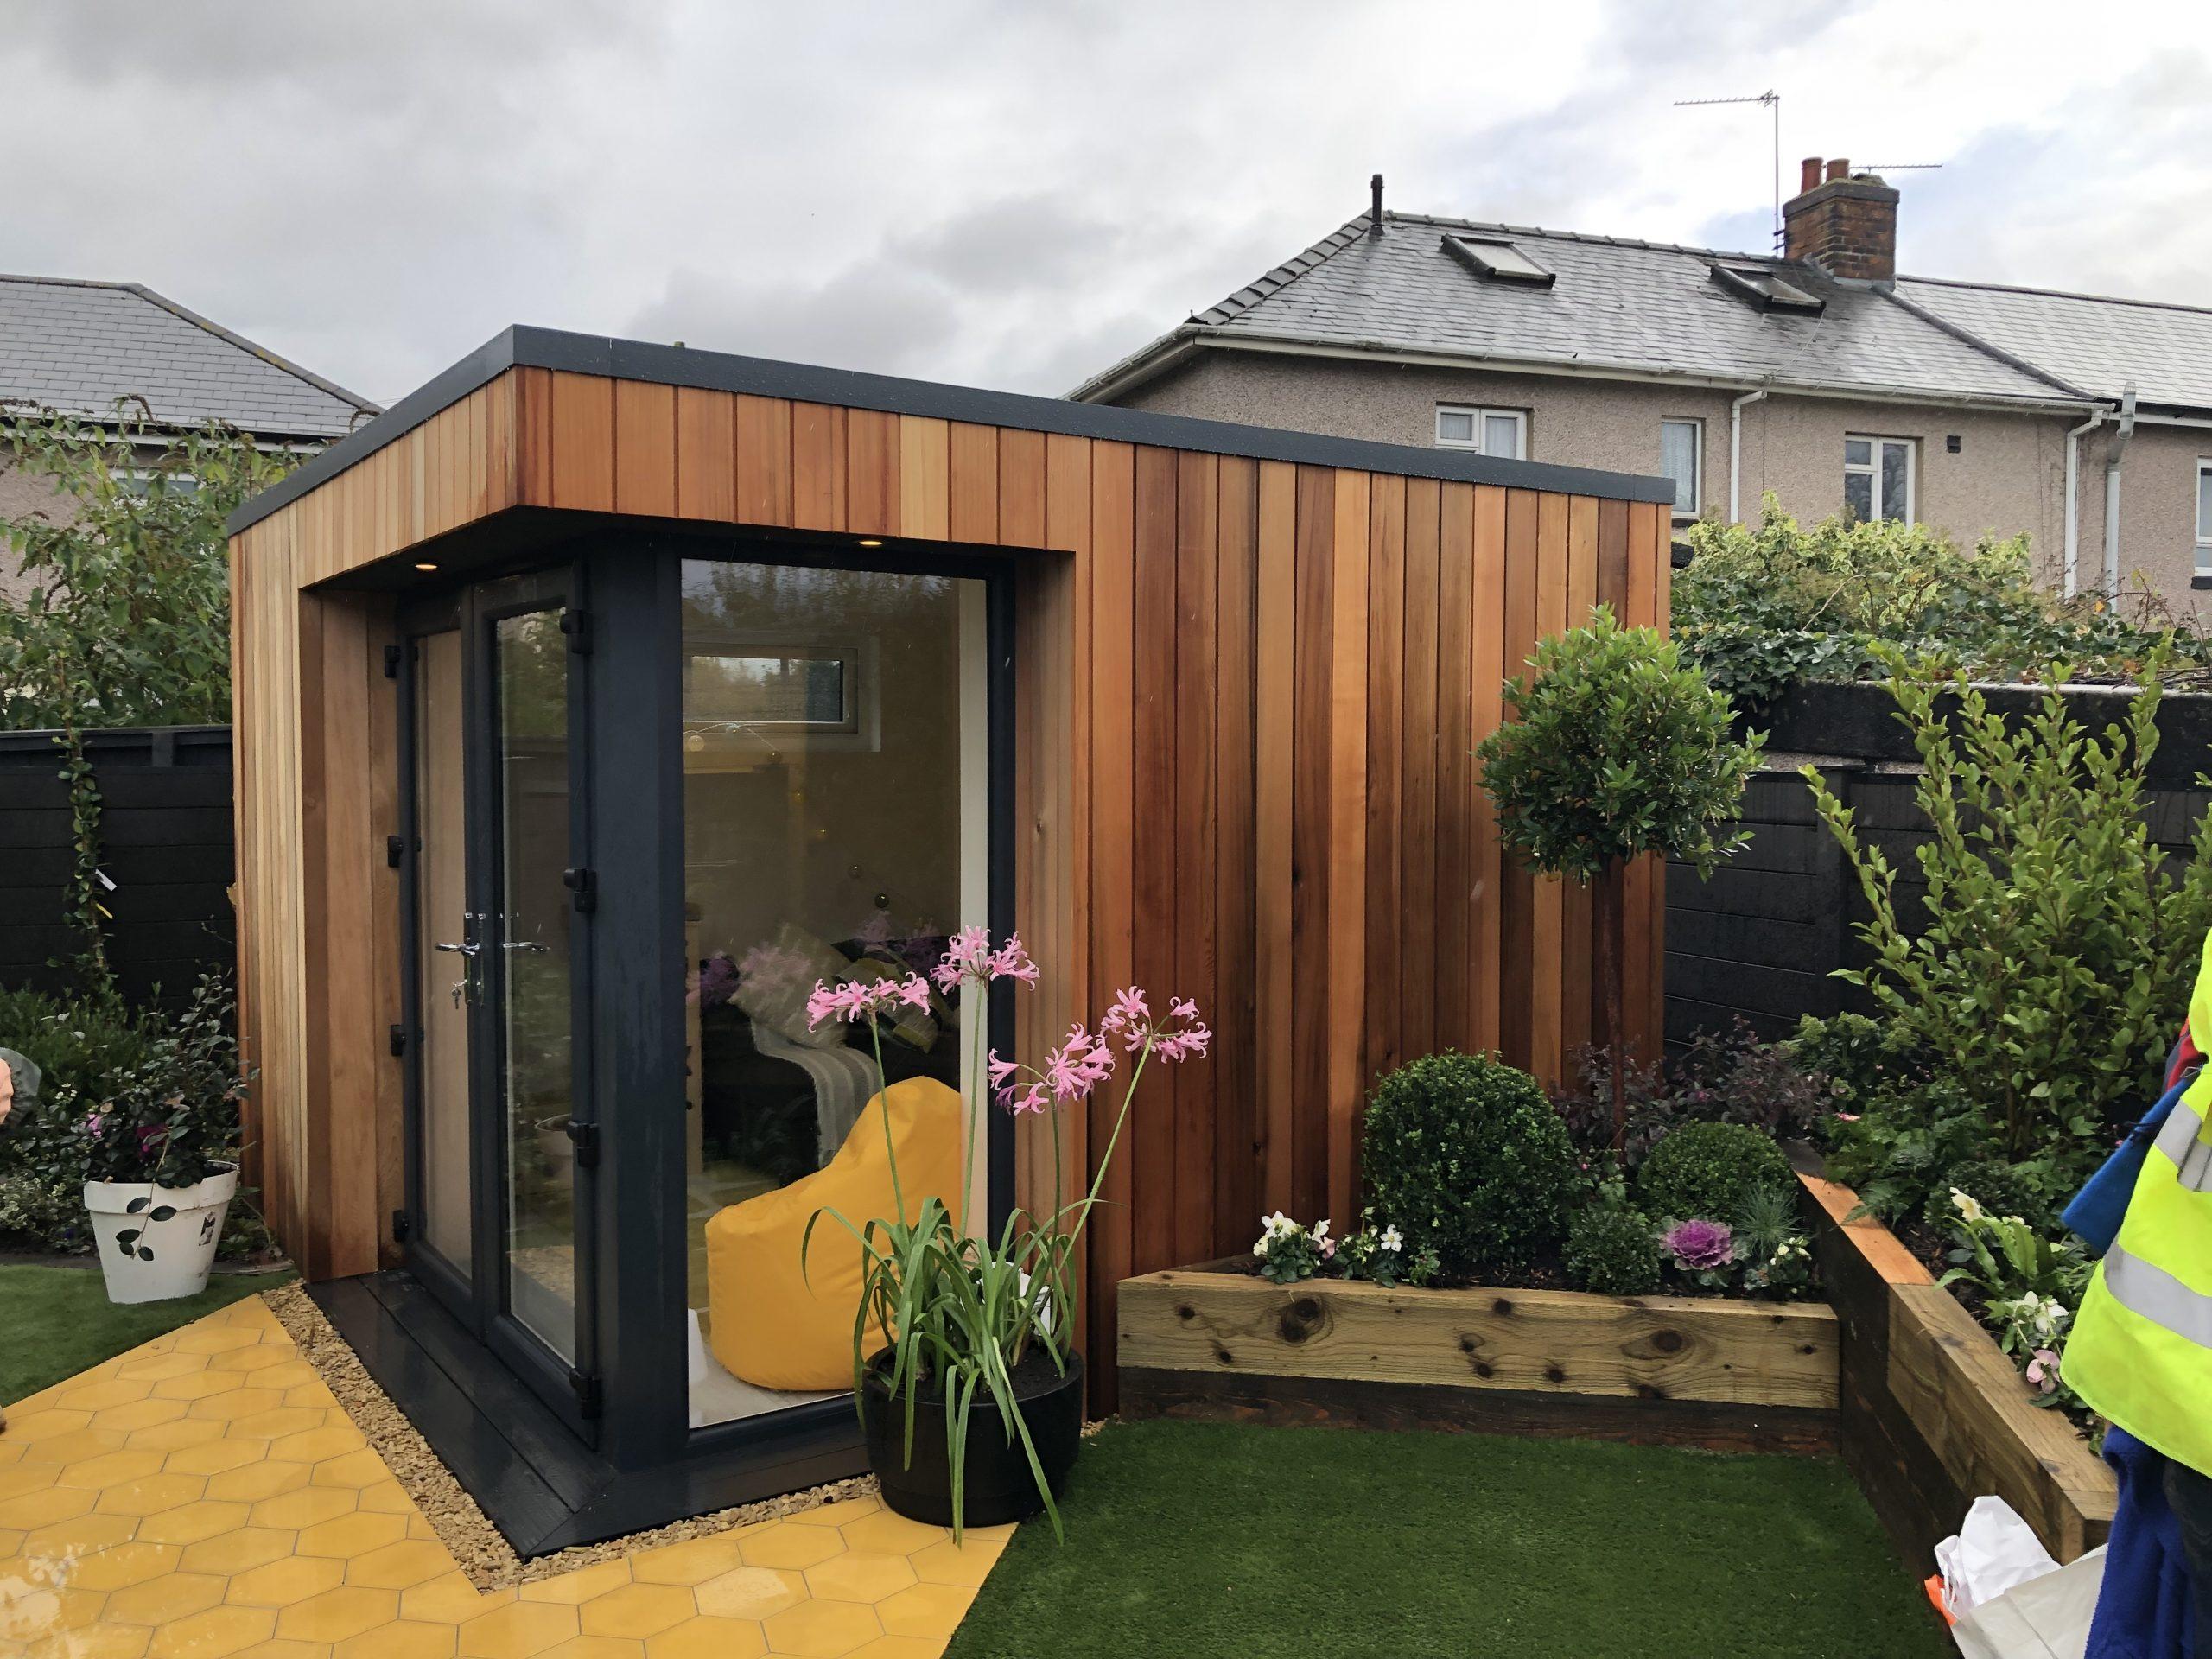 A Vivid Green garden studio with storage – Space for storage